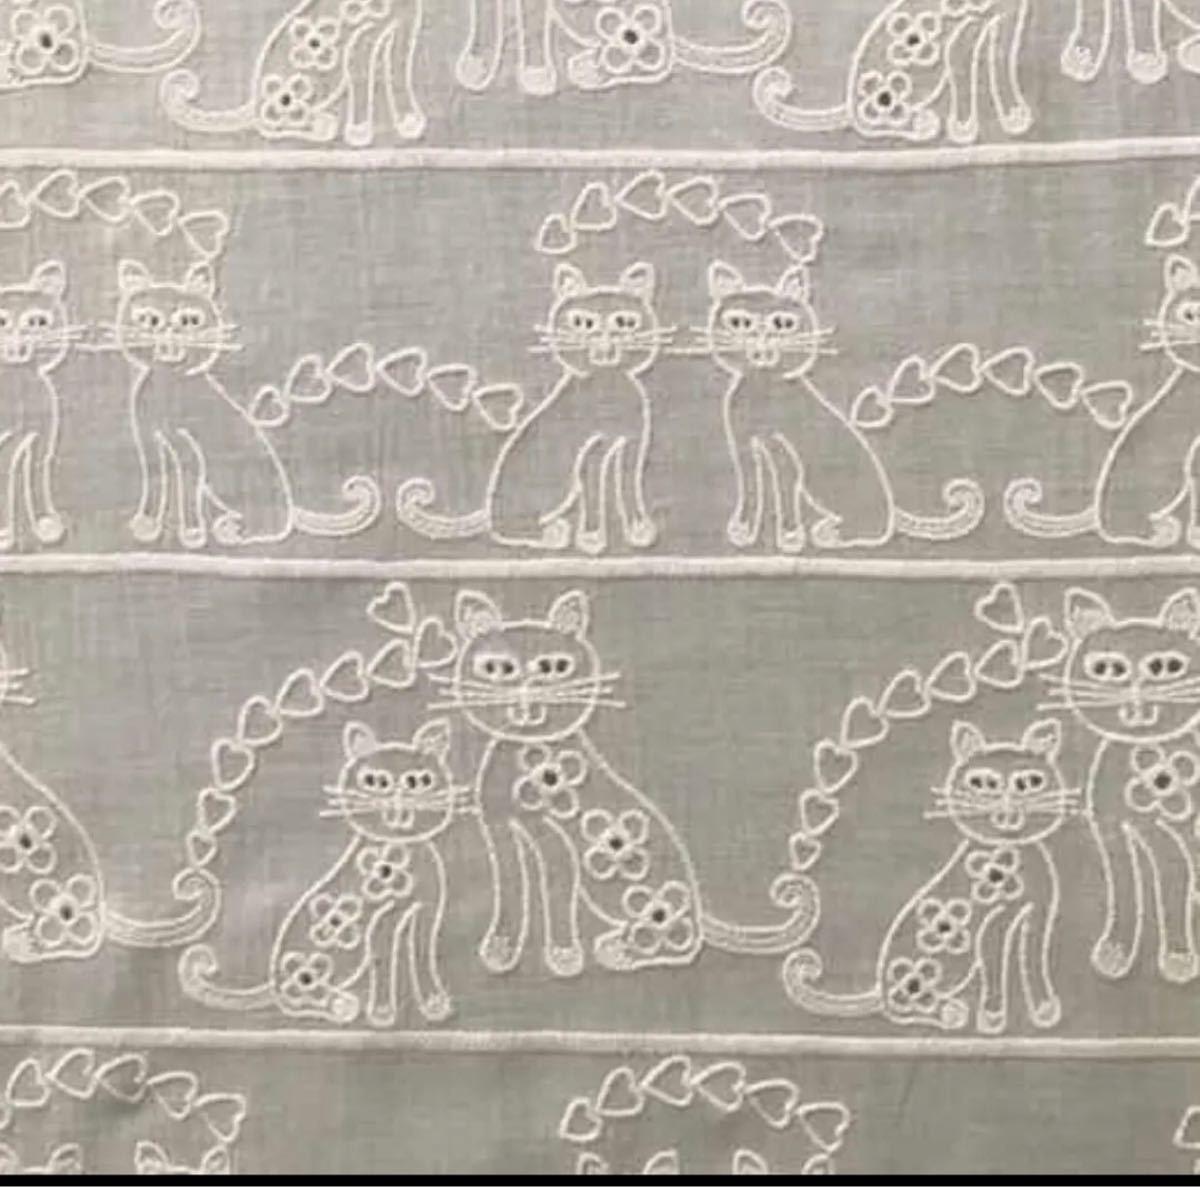 綿レース生地 猫柄 マスク用 LA029